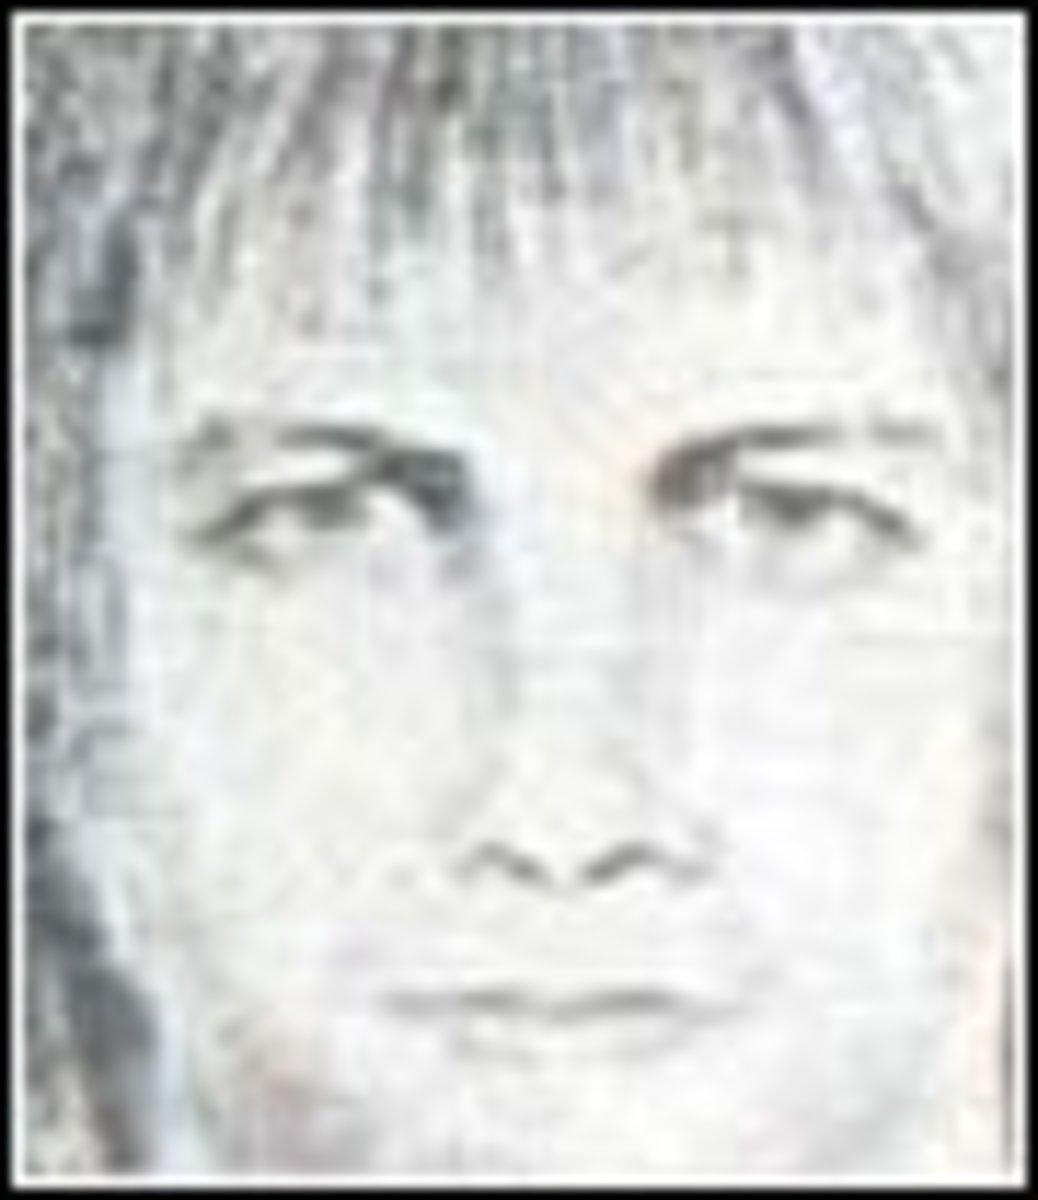 diane-downs-martyr-or-murderess